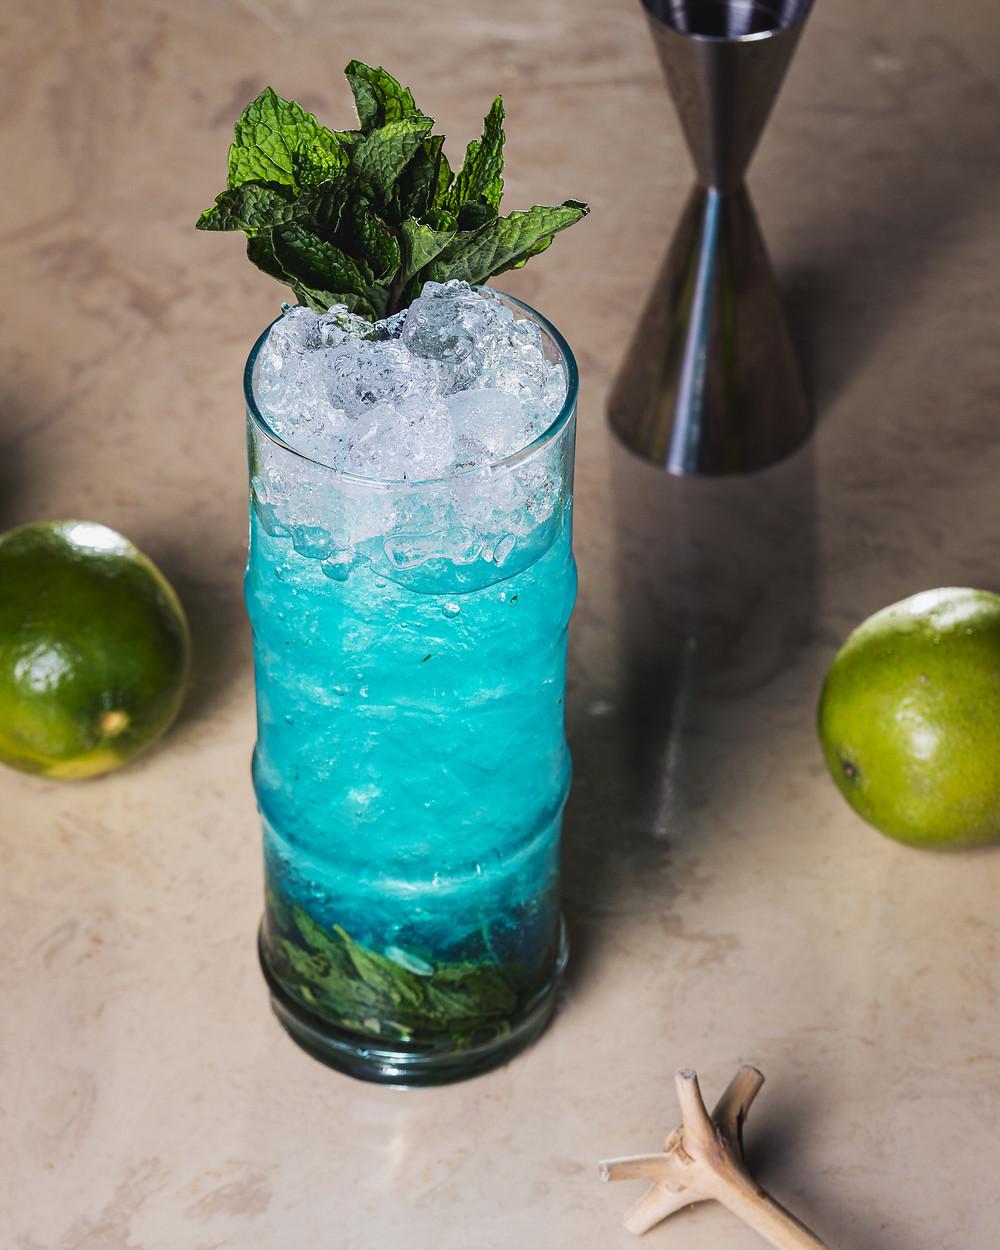 Midtown Miami's Sylvester Cocktailery